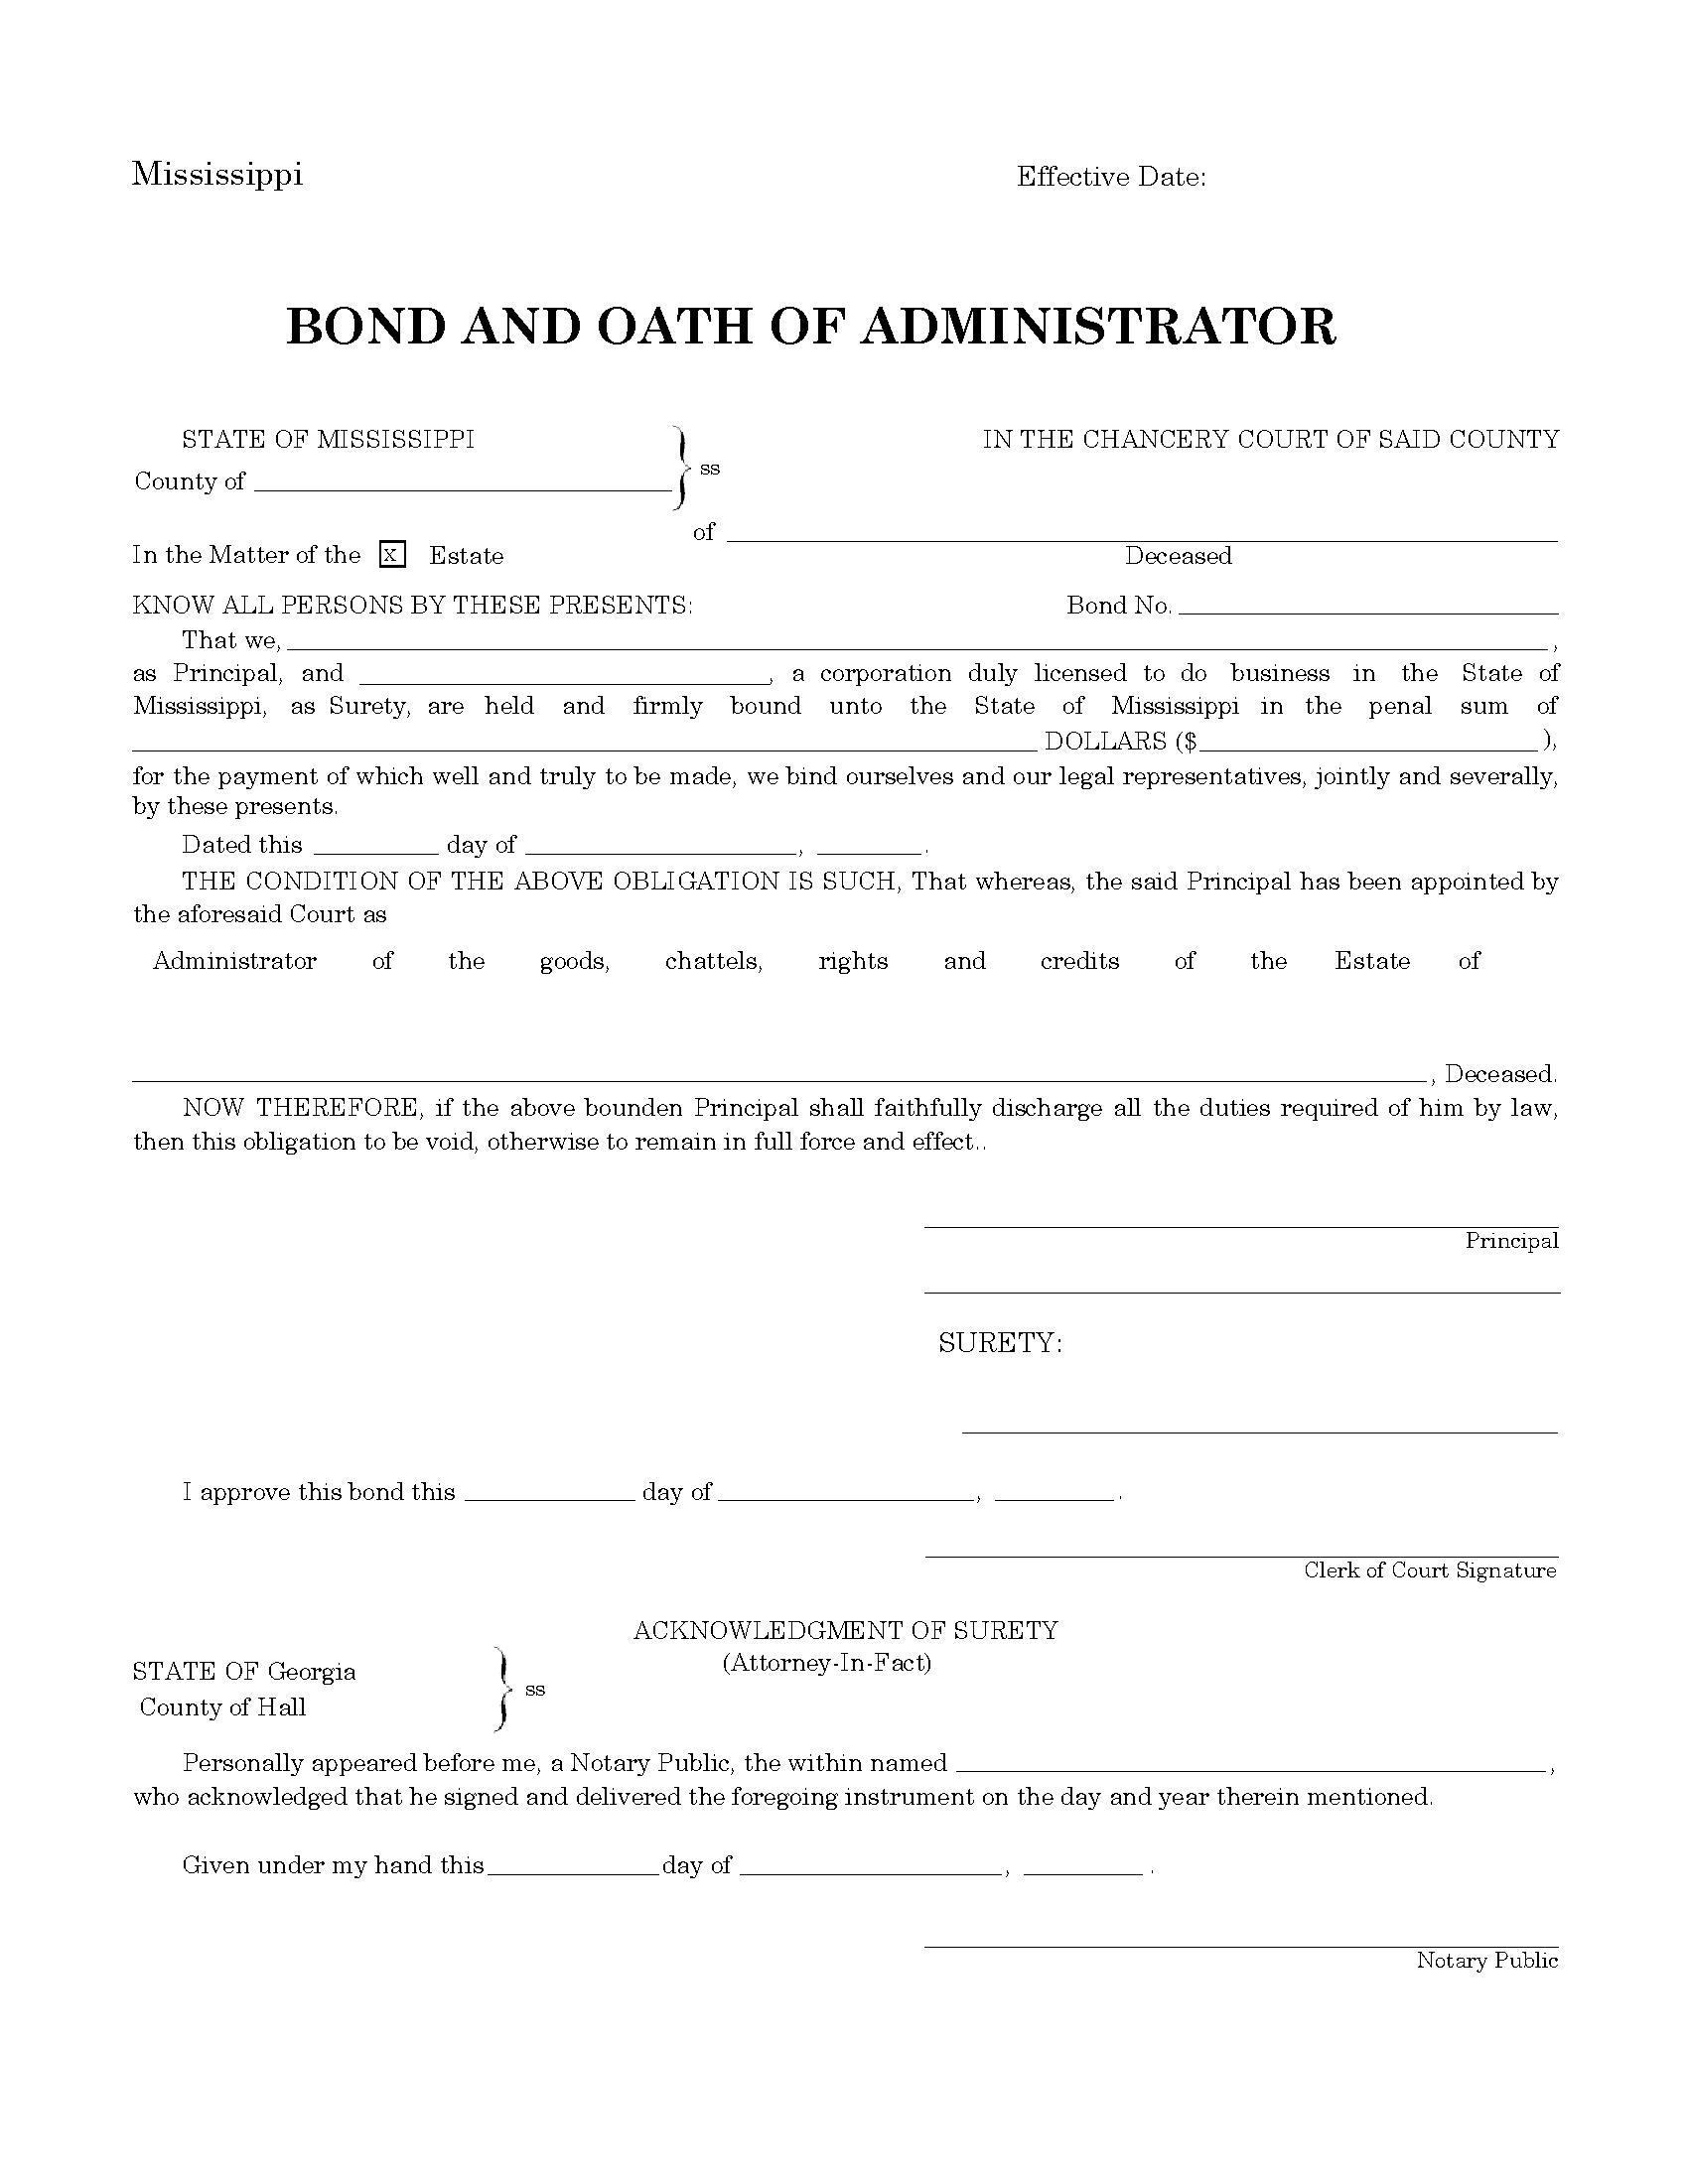 Administrator sample image